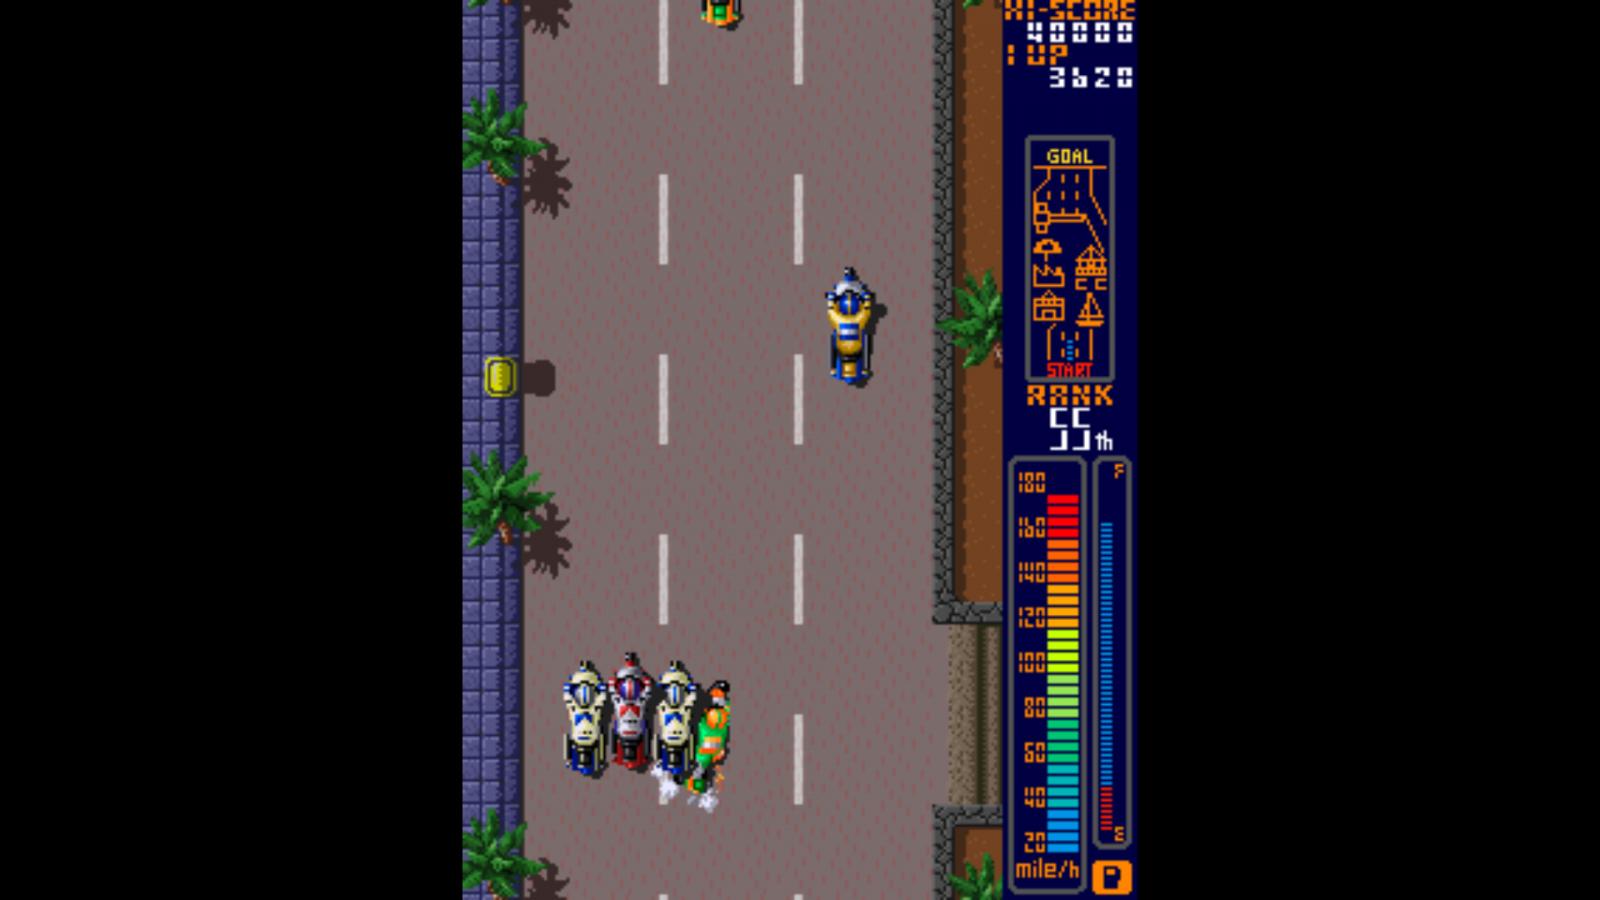 Rally Bike - arcade